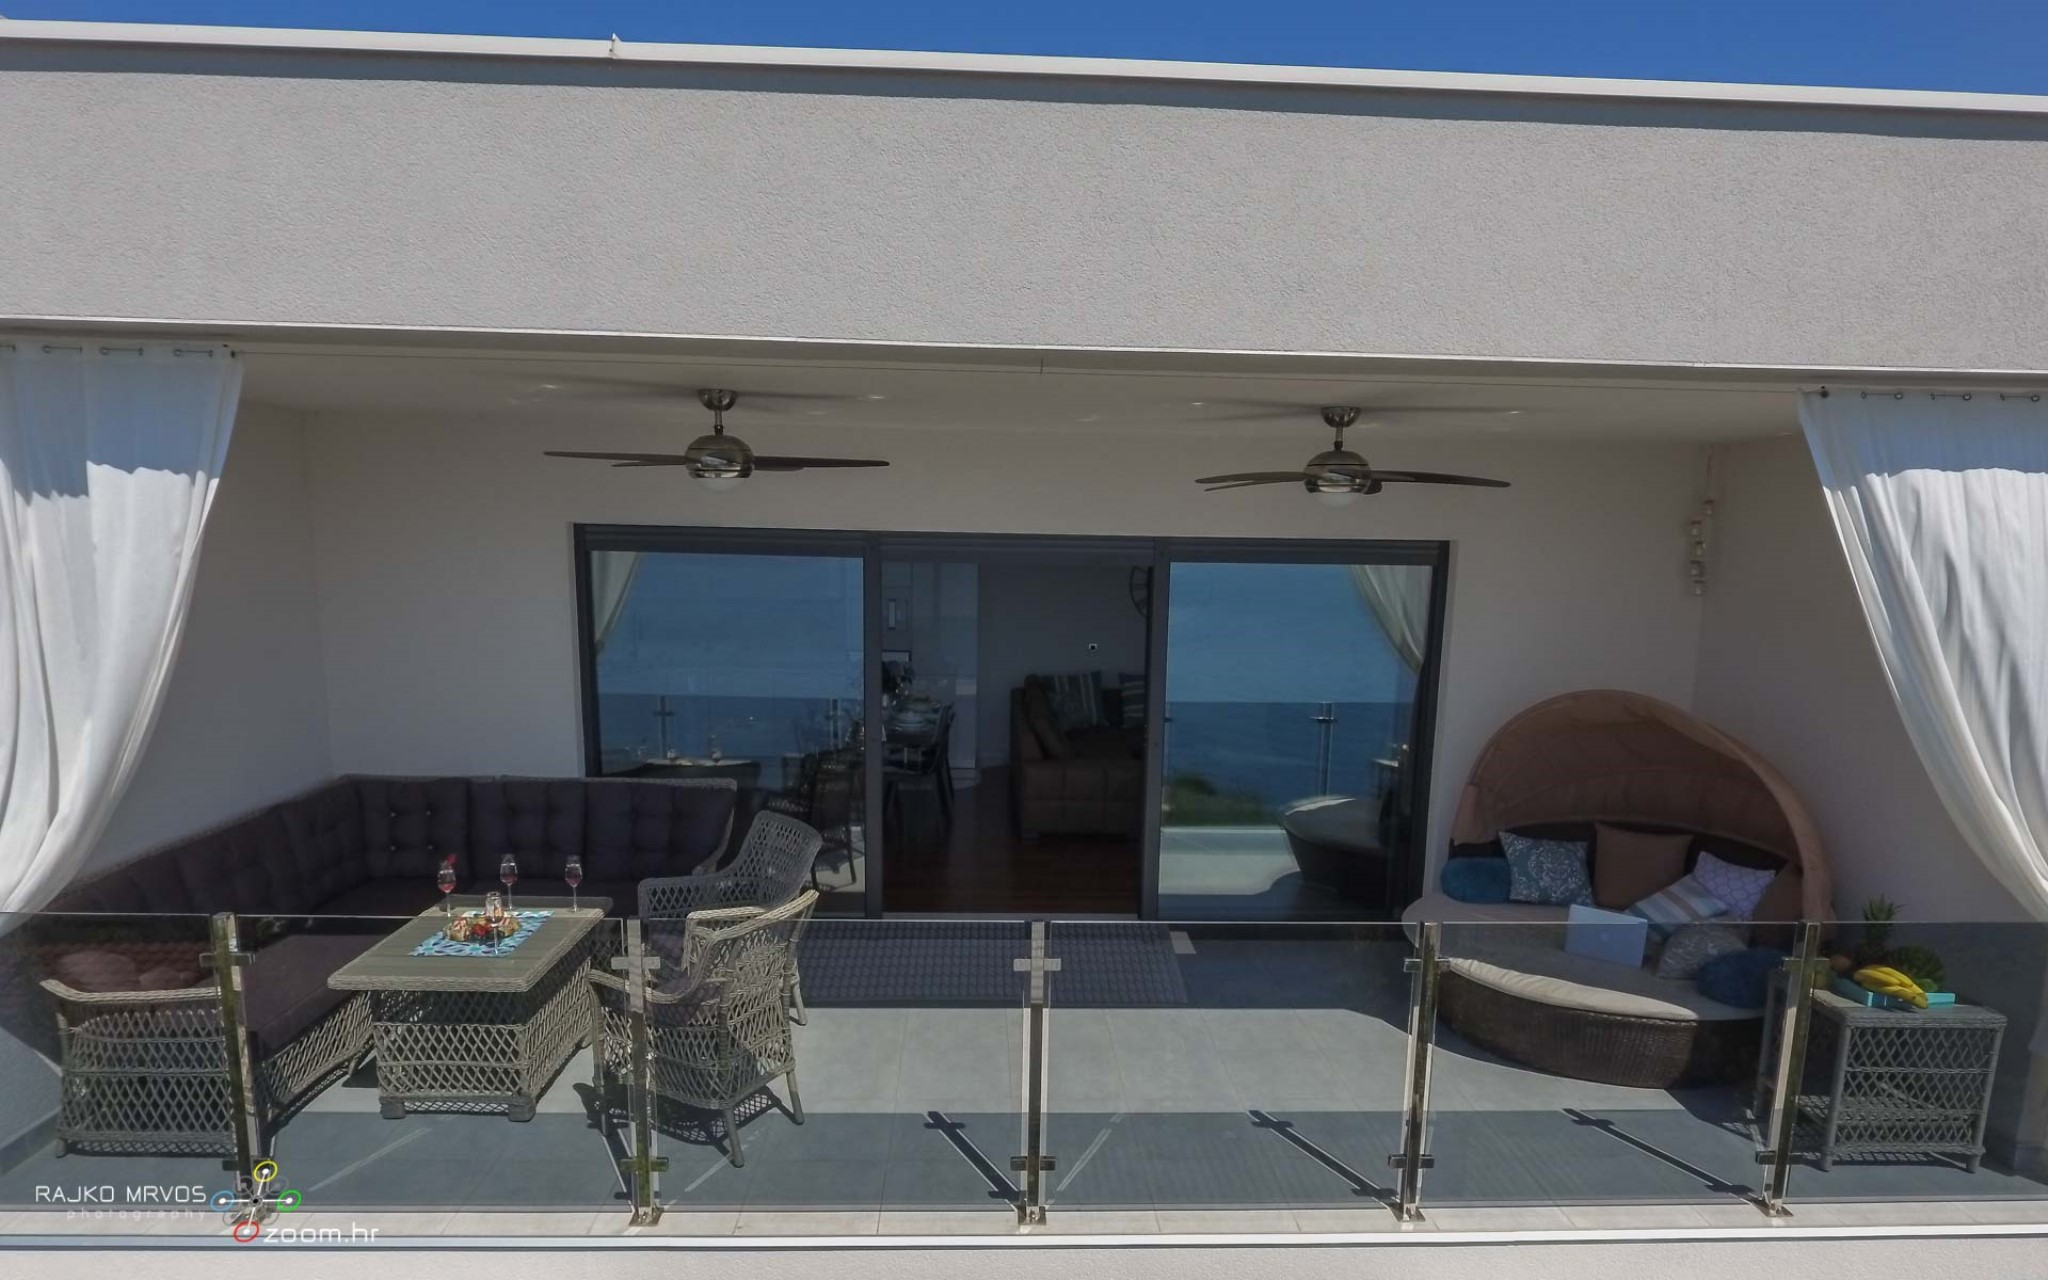 fotografiranje-iz-zraka-eksterijera-dronom-vila-kuca-hotela-apartmana-Larimar-Penthouse-58